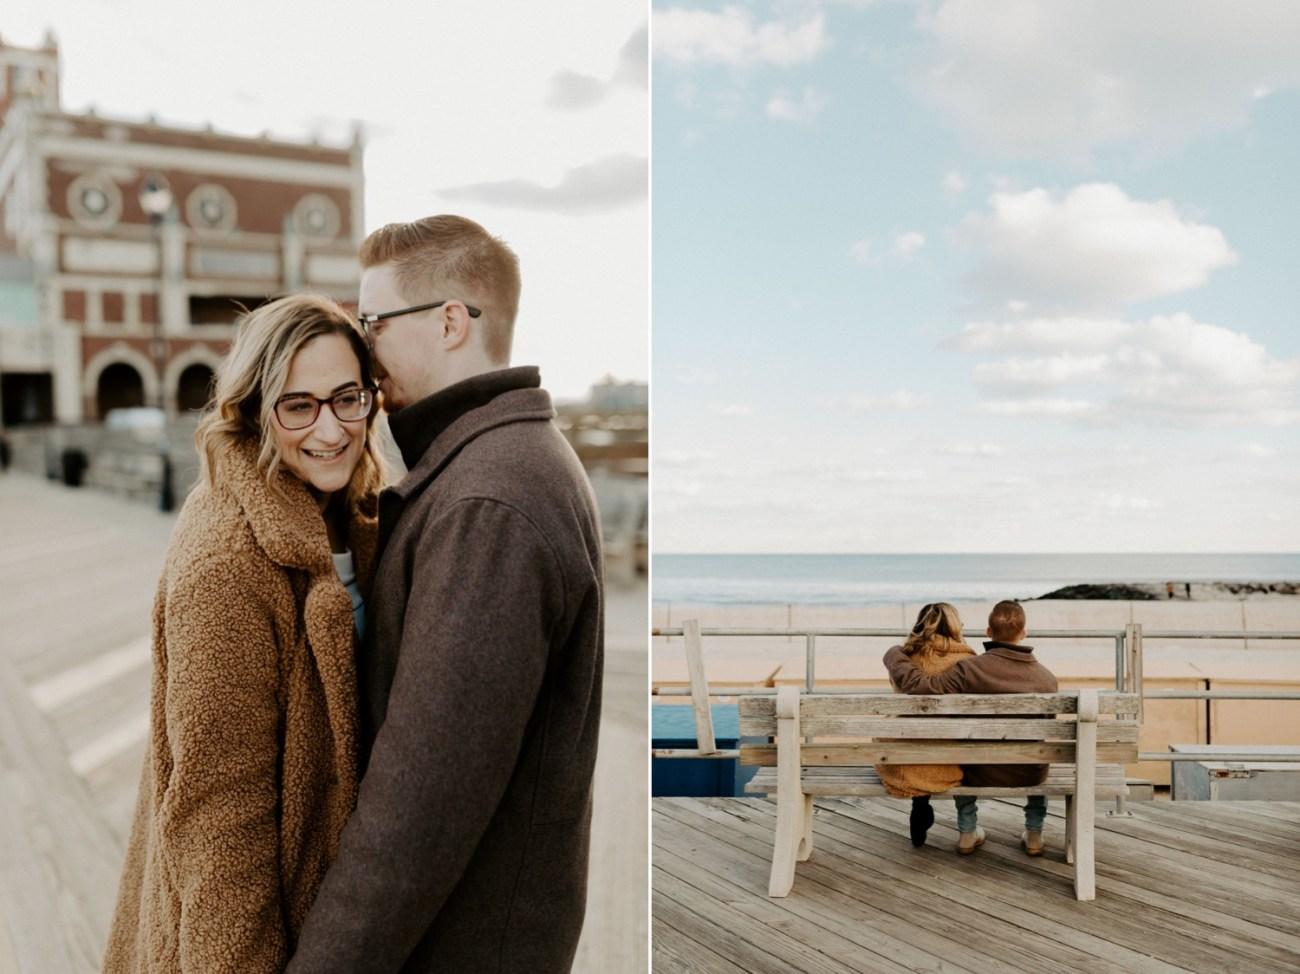 Asbury Park Engagement Photos Winter Beach Engagement Session New Jersey Wedding Photographer Anais Possamai Photography 004